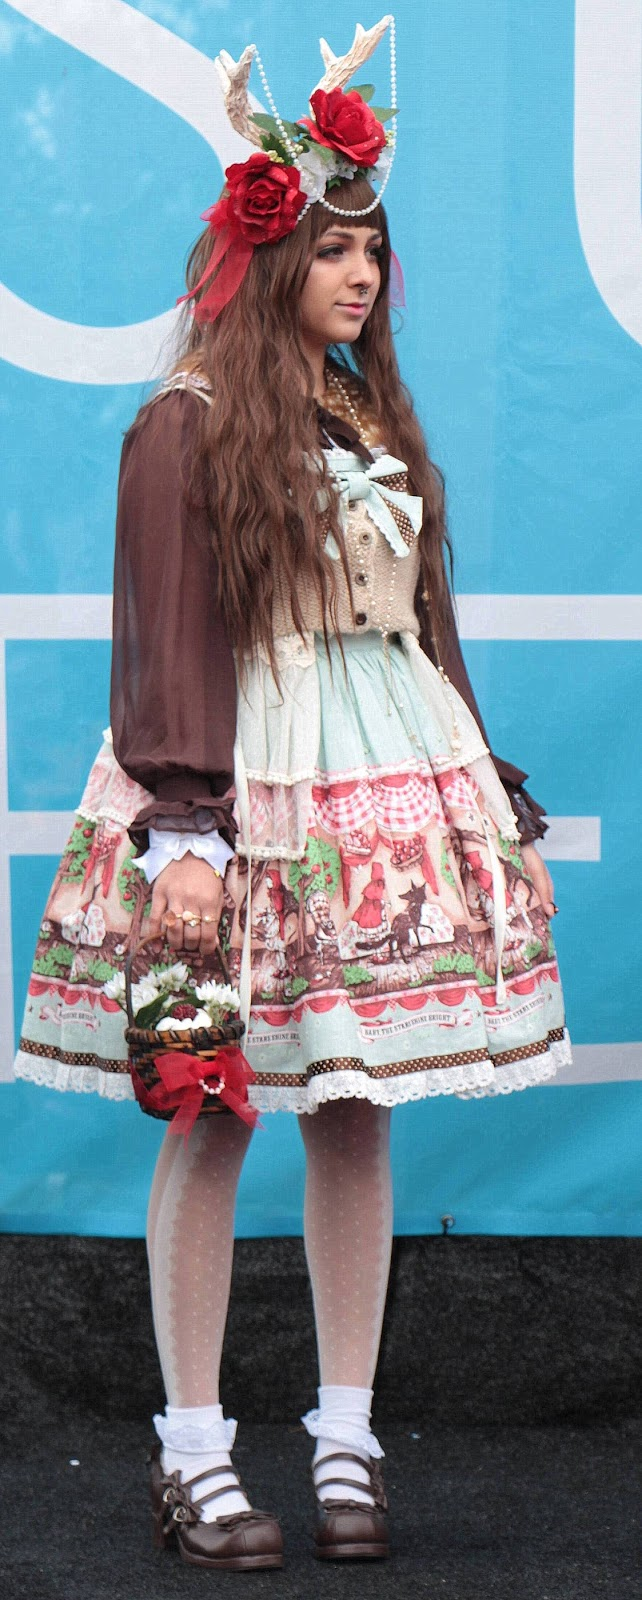 j pop summit, baby the stars shine bright, deer headband, lolita fashion, harajuku, japanese